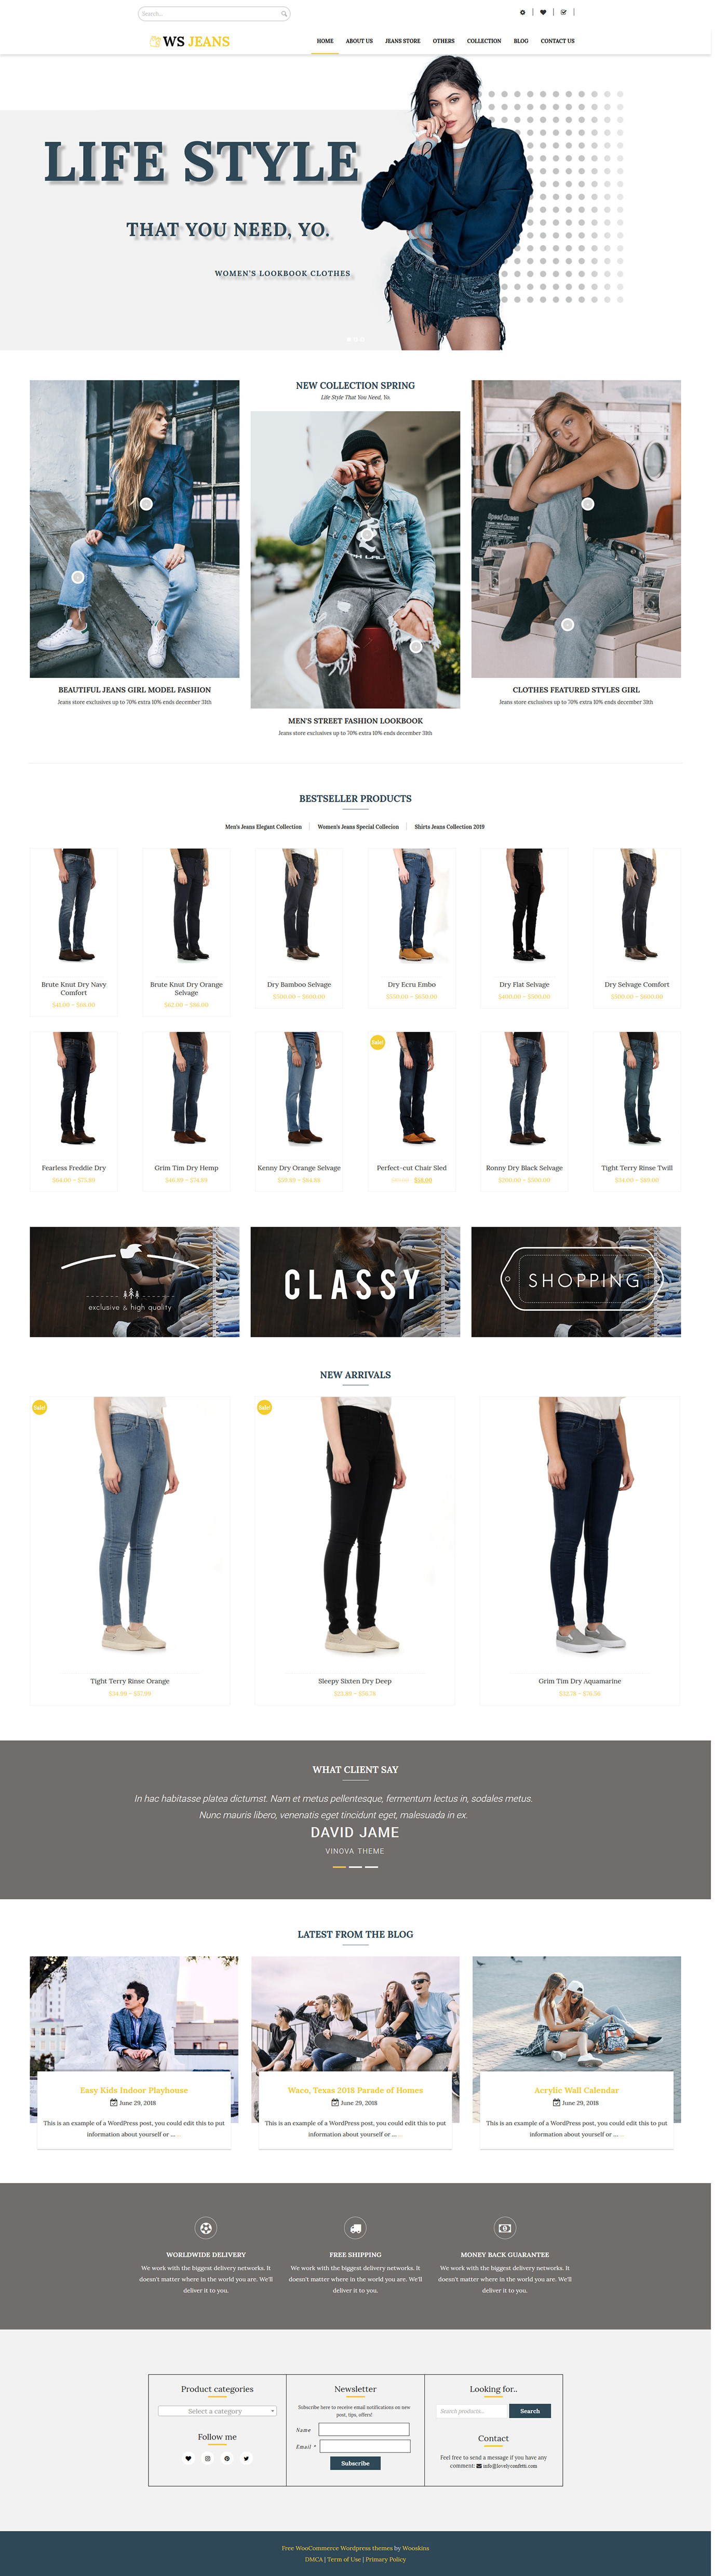 Clothing WordPress Theme Fashion WordPress Theme wordpress theme WooCommerce WordPress Theme